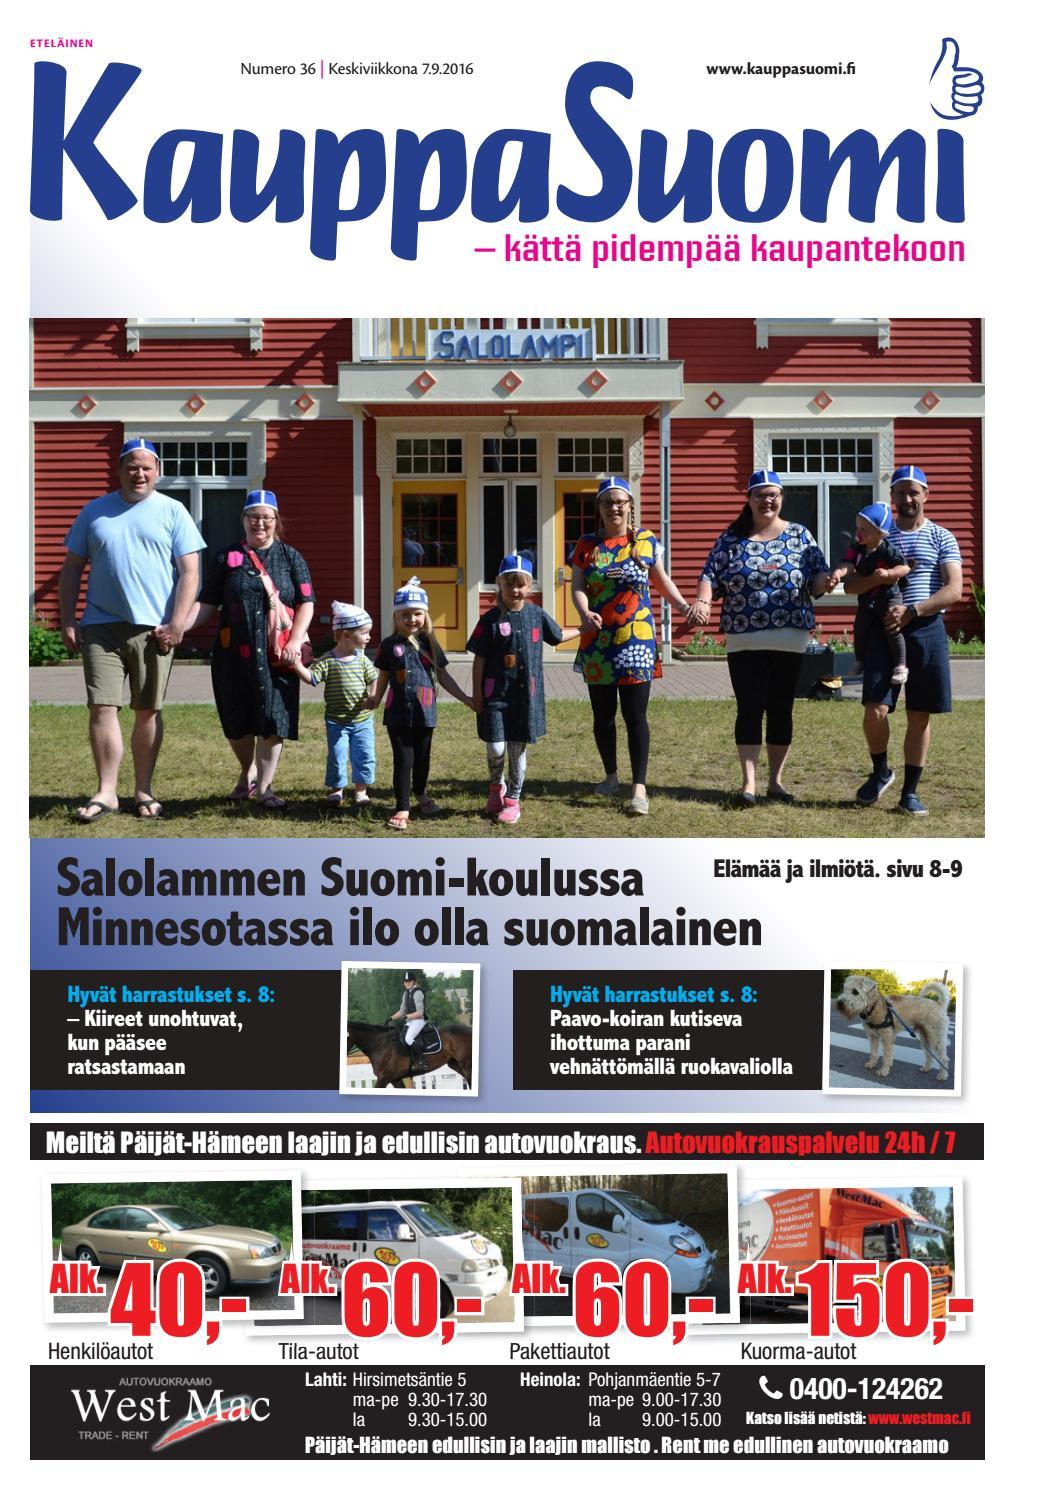 KauppaSuomi 36 2016 (E) by KauppaSuomi - issuu 9f6c1ffcb5